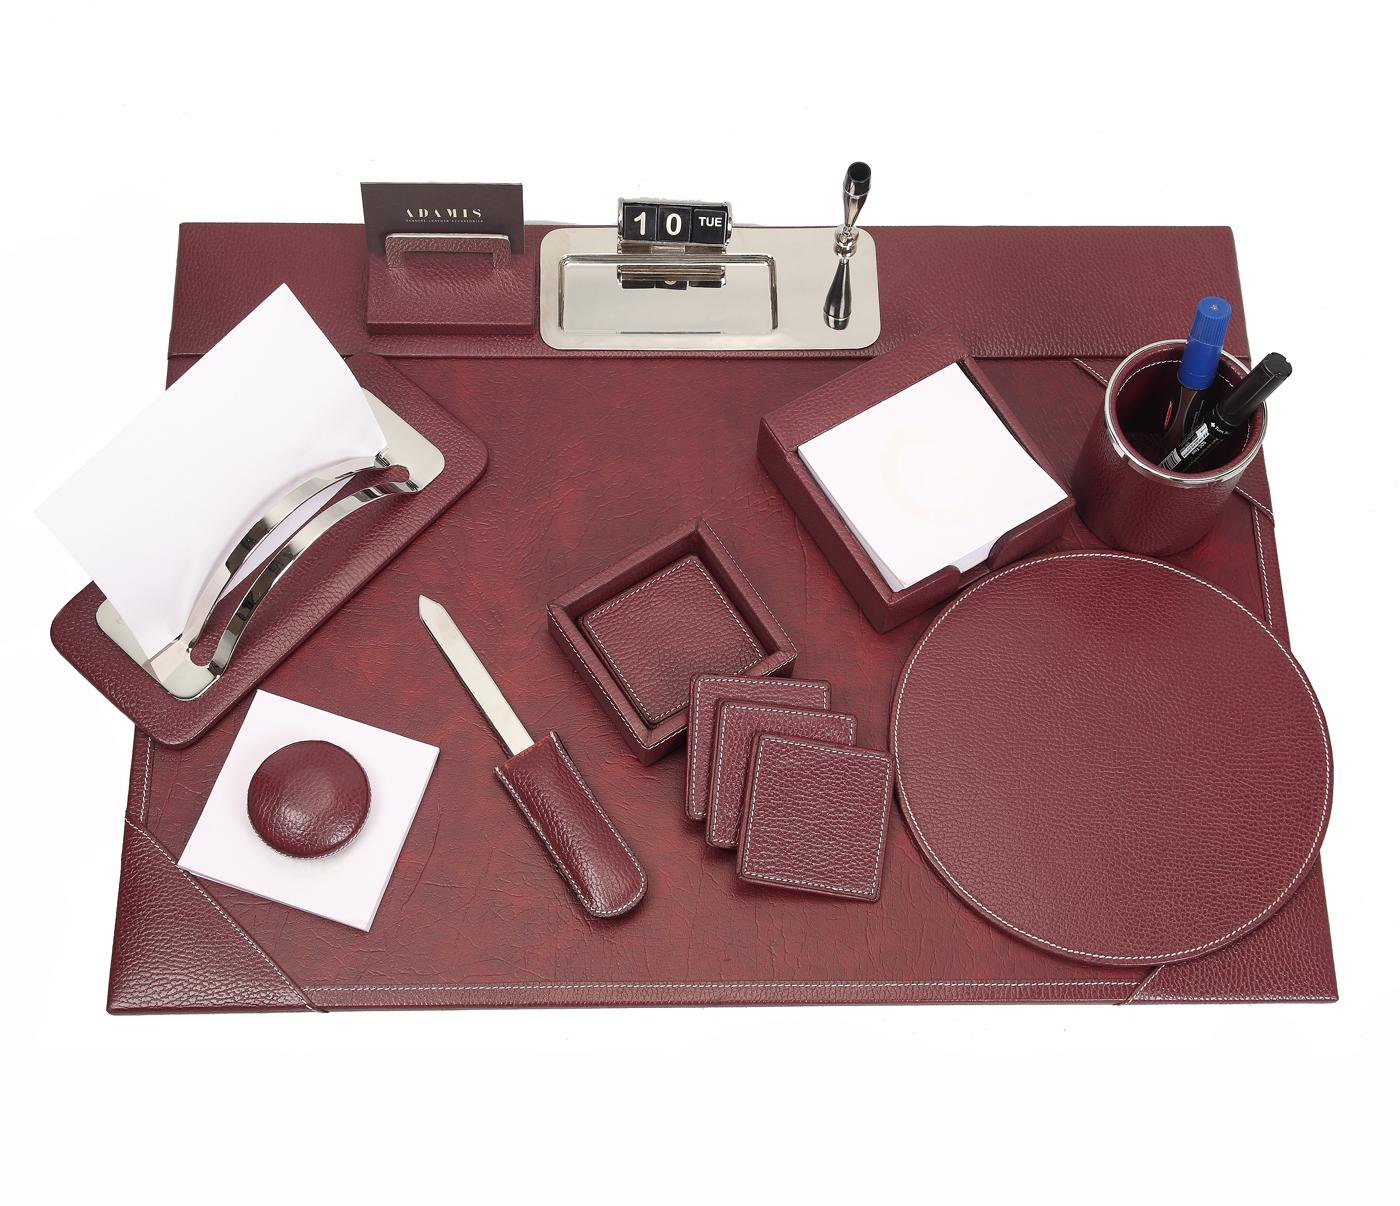 DSK1--8pcs office desk set organizer in Genuine Leather - Wine